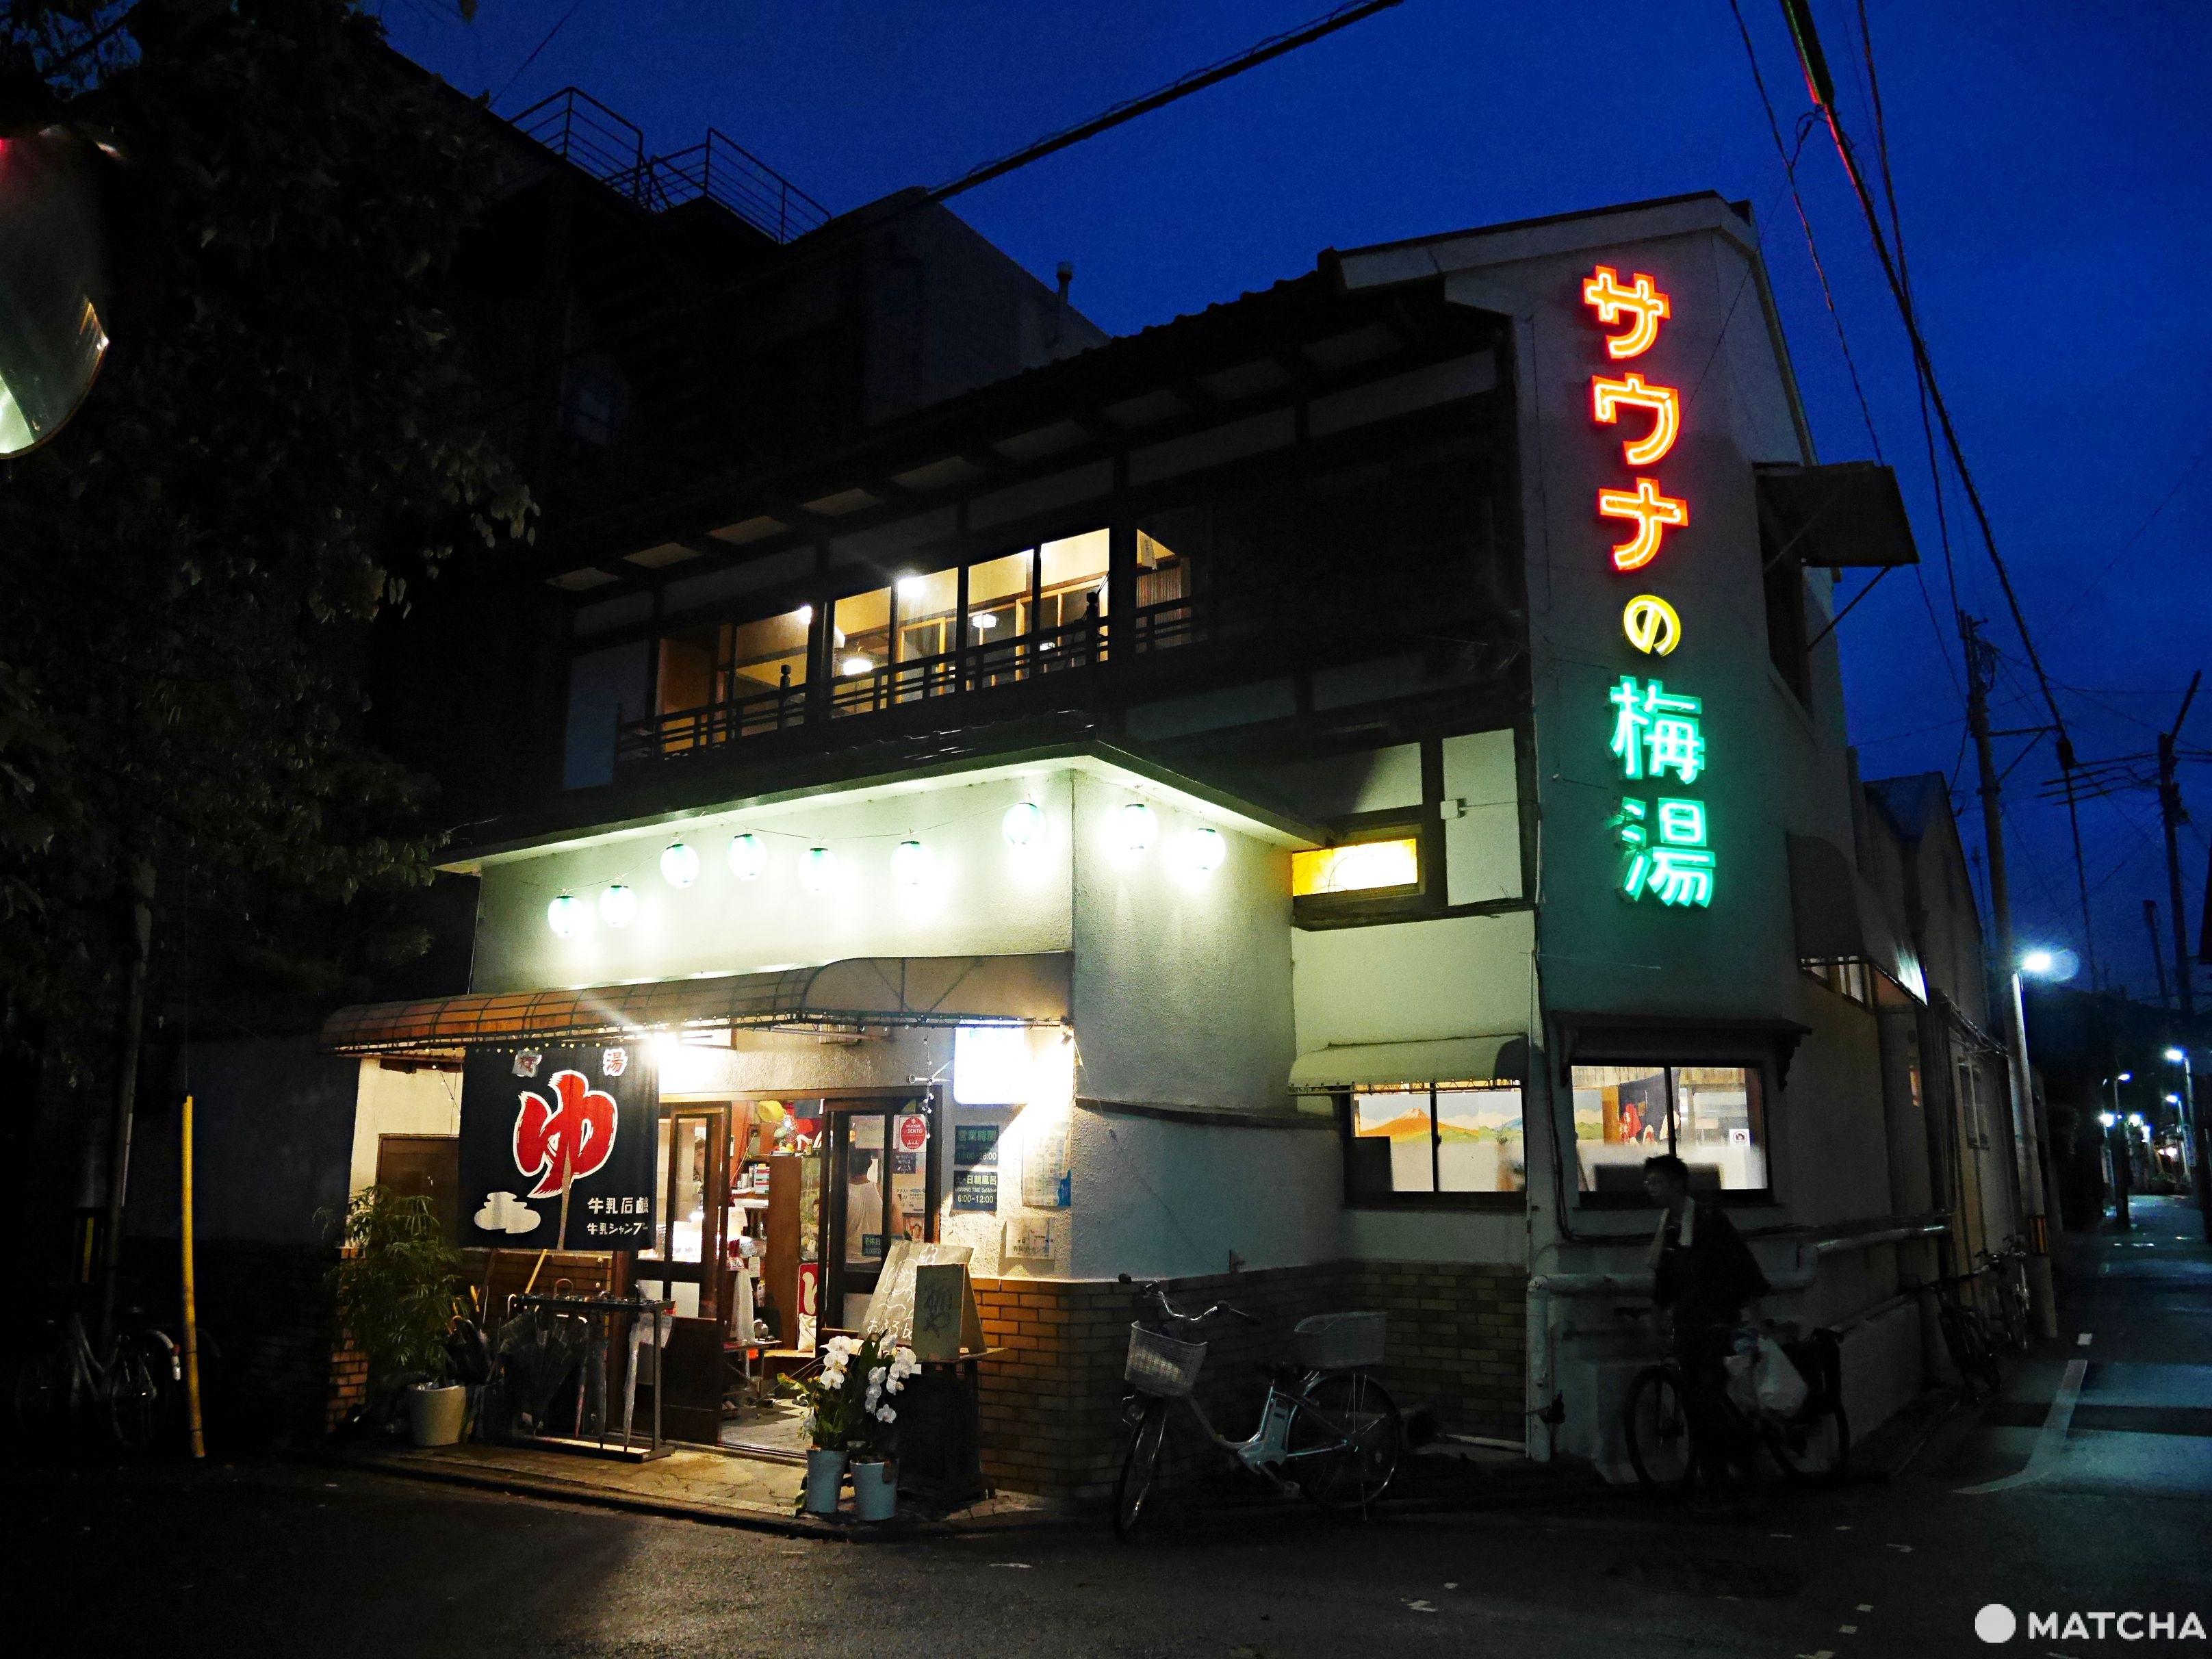 【京都】樓上就是刺青店!最顛覆常識的錢湯 「サウナの梅湯」